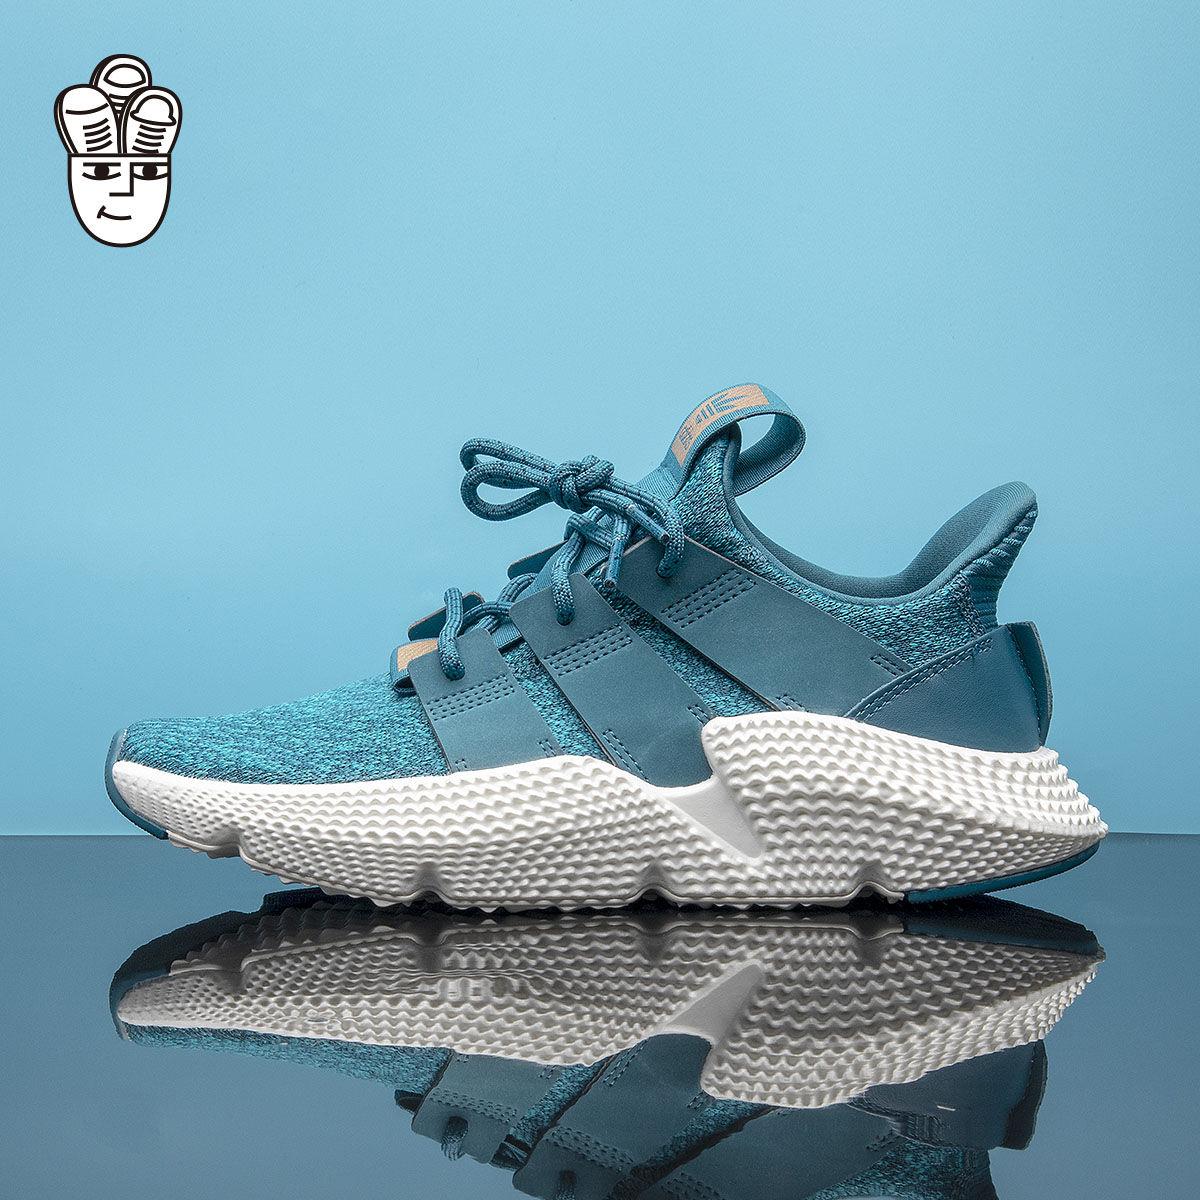 Adidas Prophere W 阿迪达斯三叶草女鞋 运动休闲鞋跑鞋